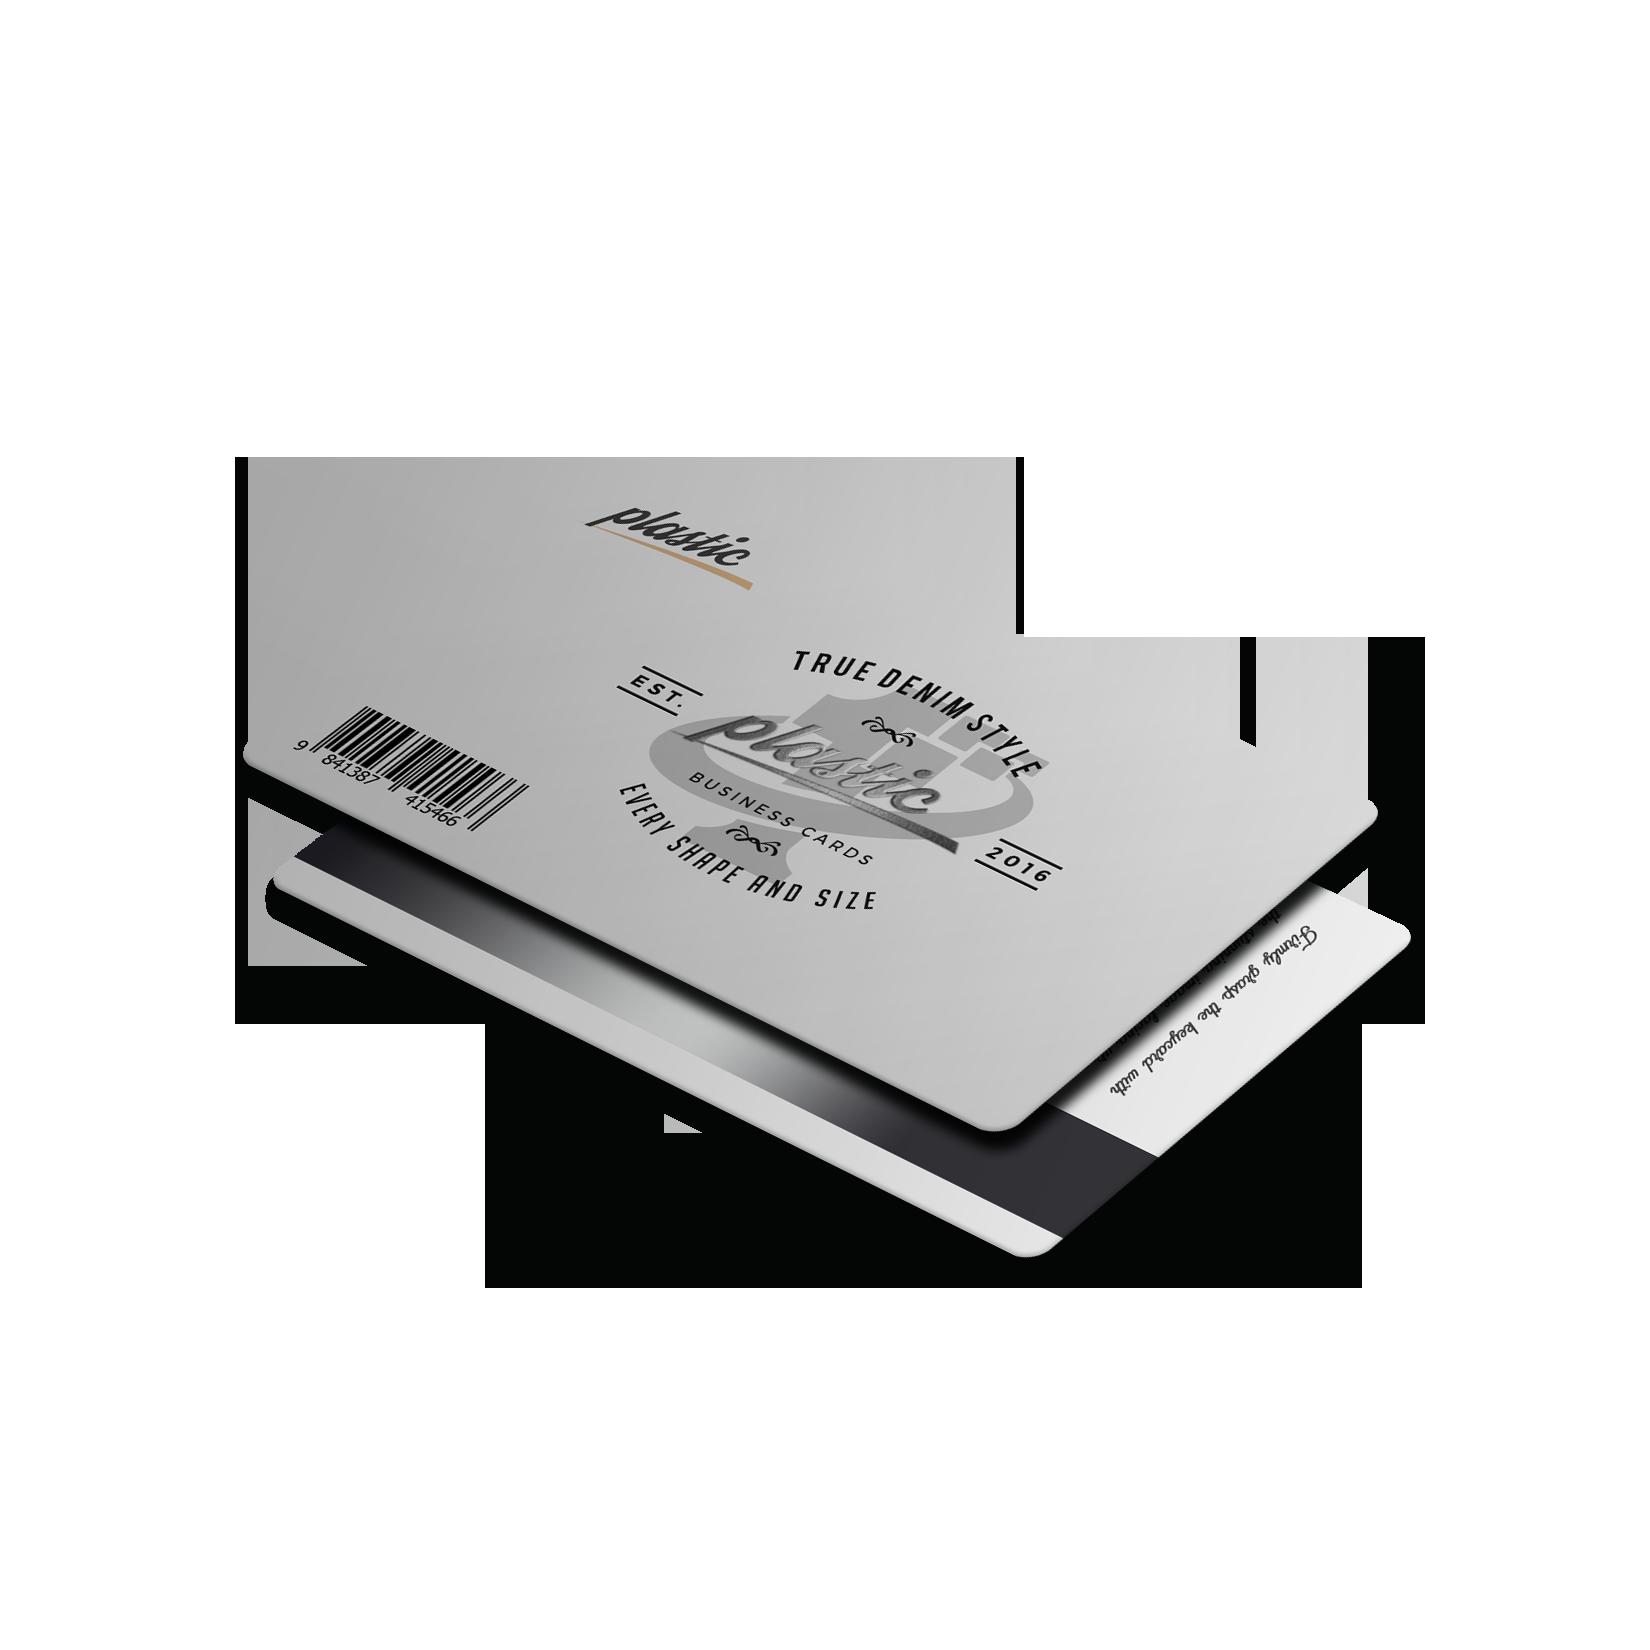 Buy online hotel card qr code signature panel uv hot laser buy online hotel card qr code signature panel uv hot laser fandeluxe Image collections